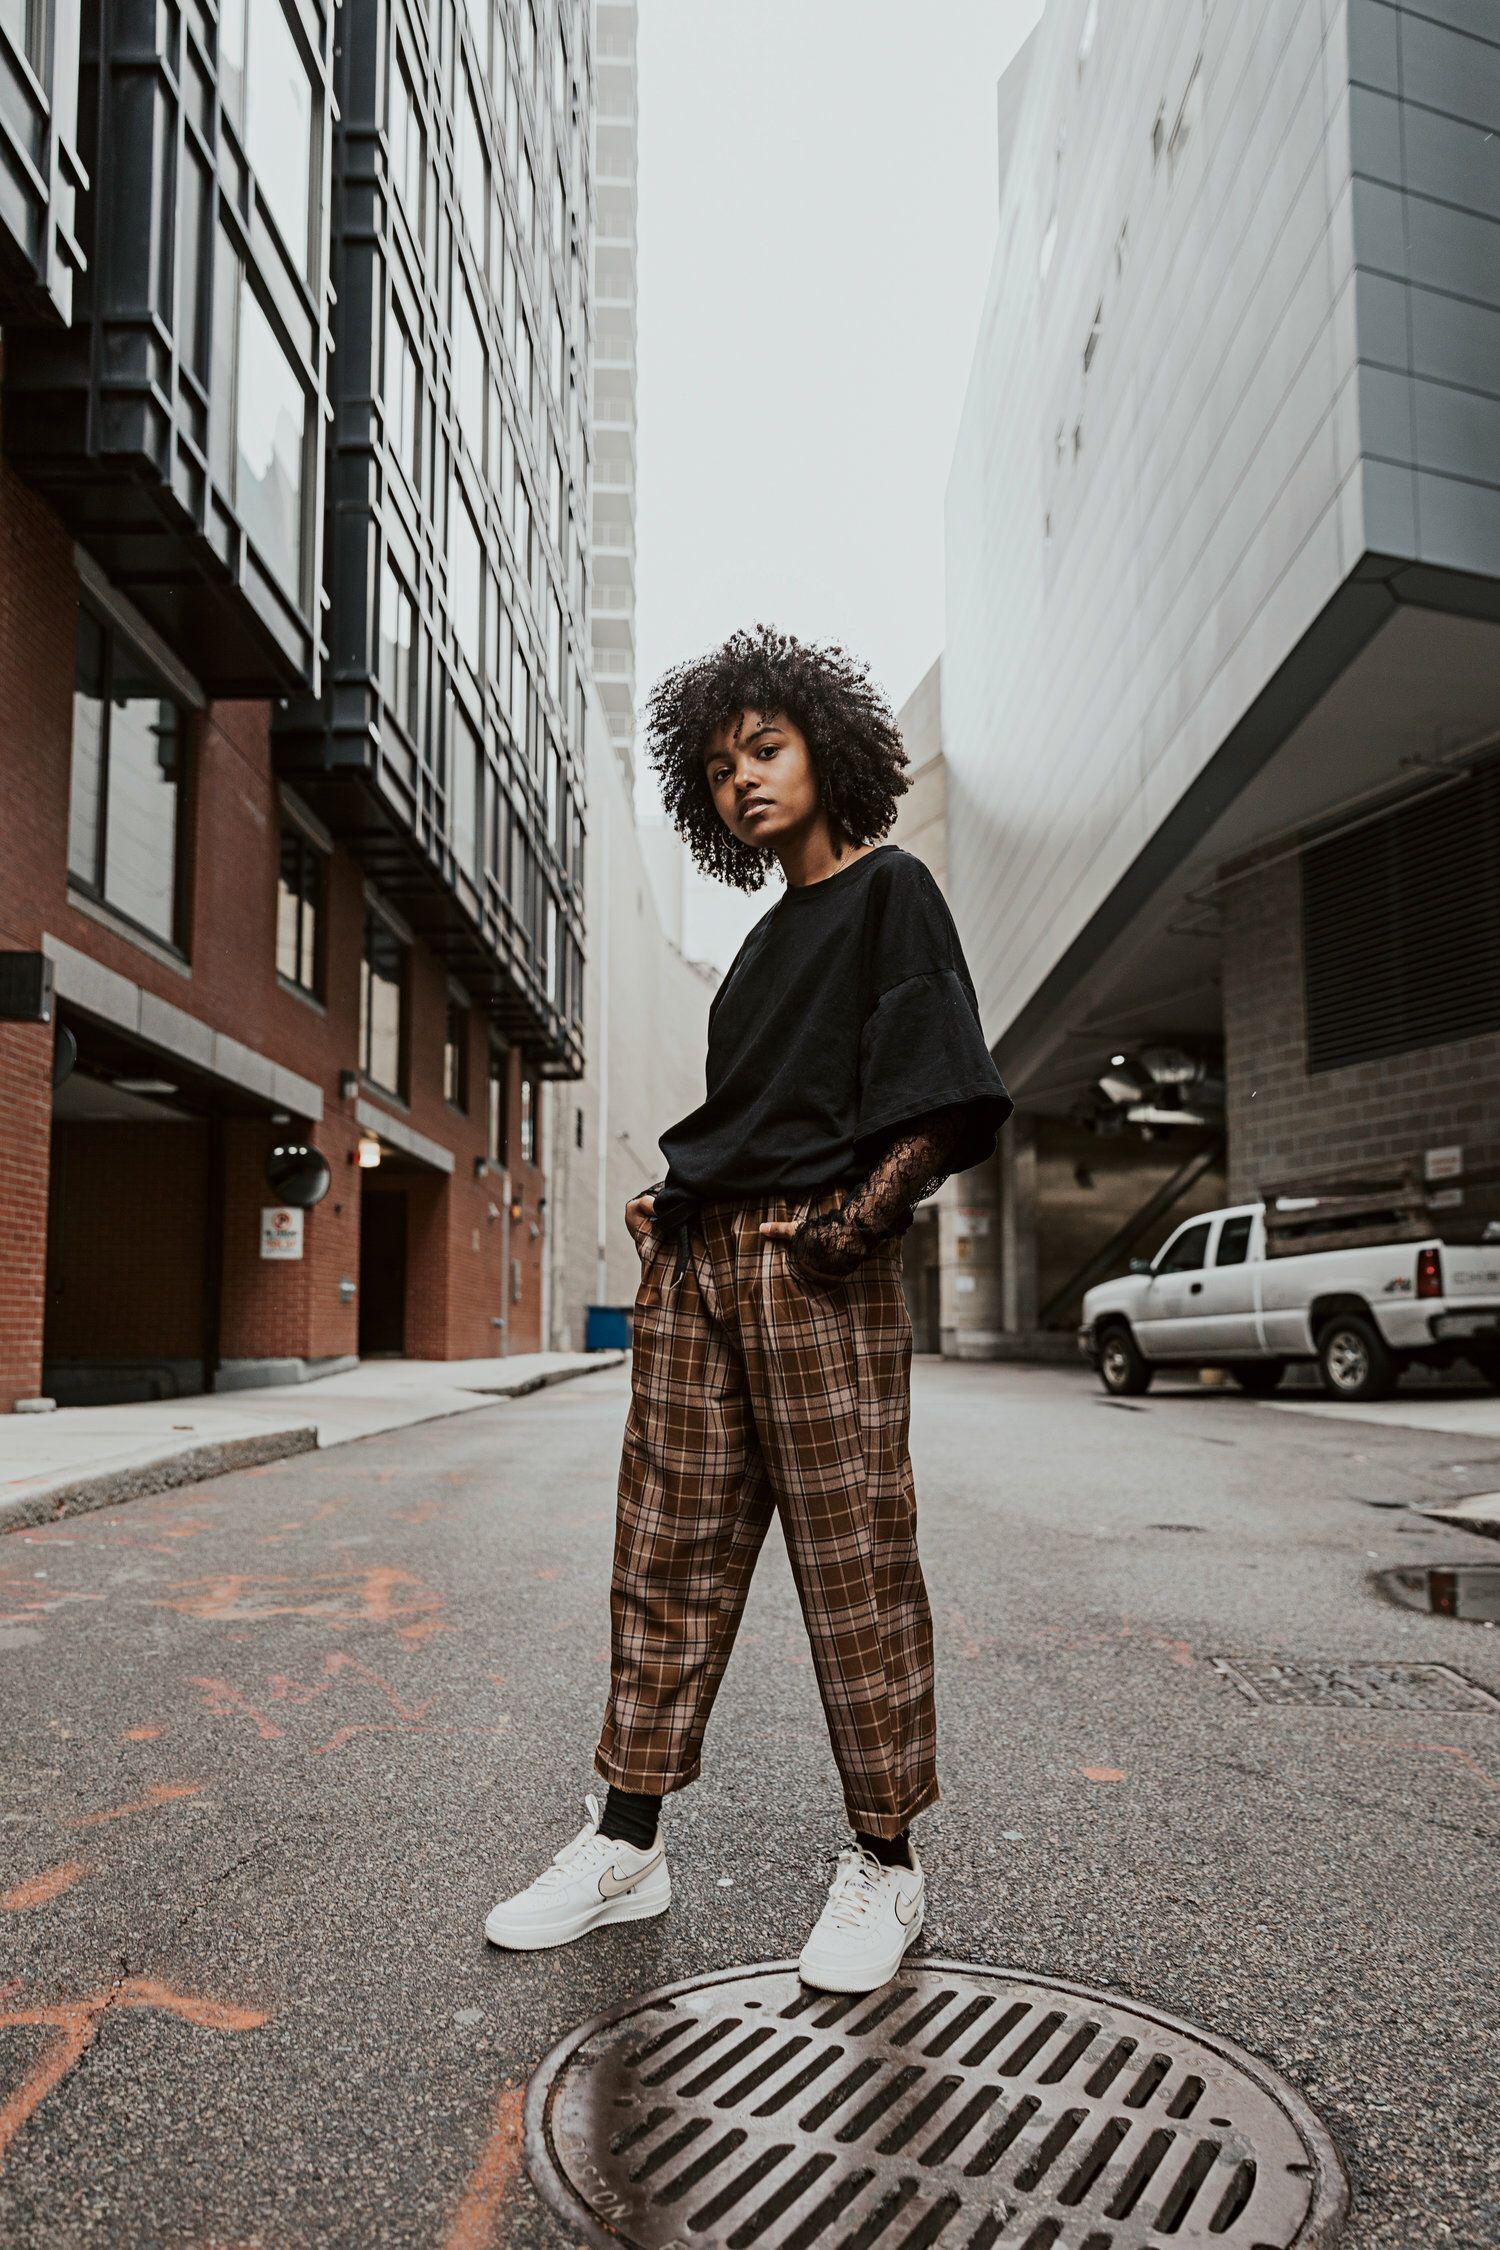 streetphotography blackgirl photography